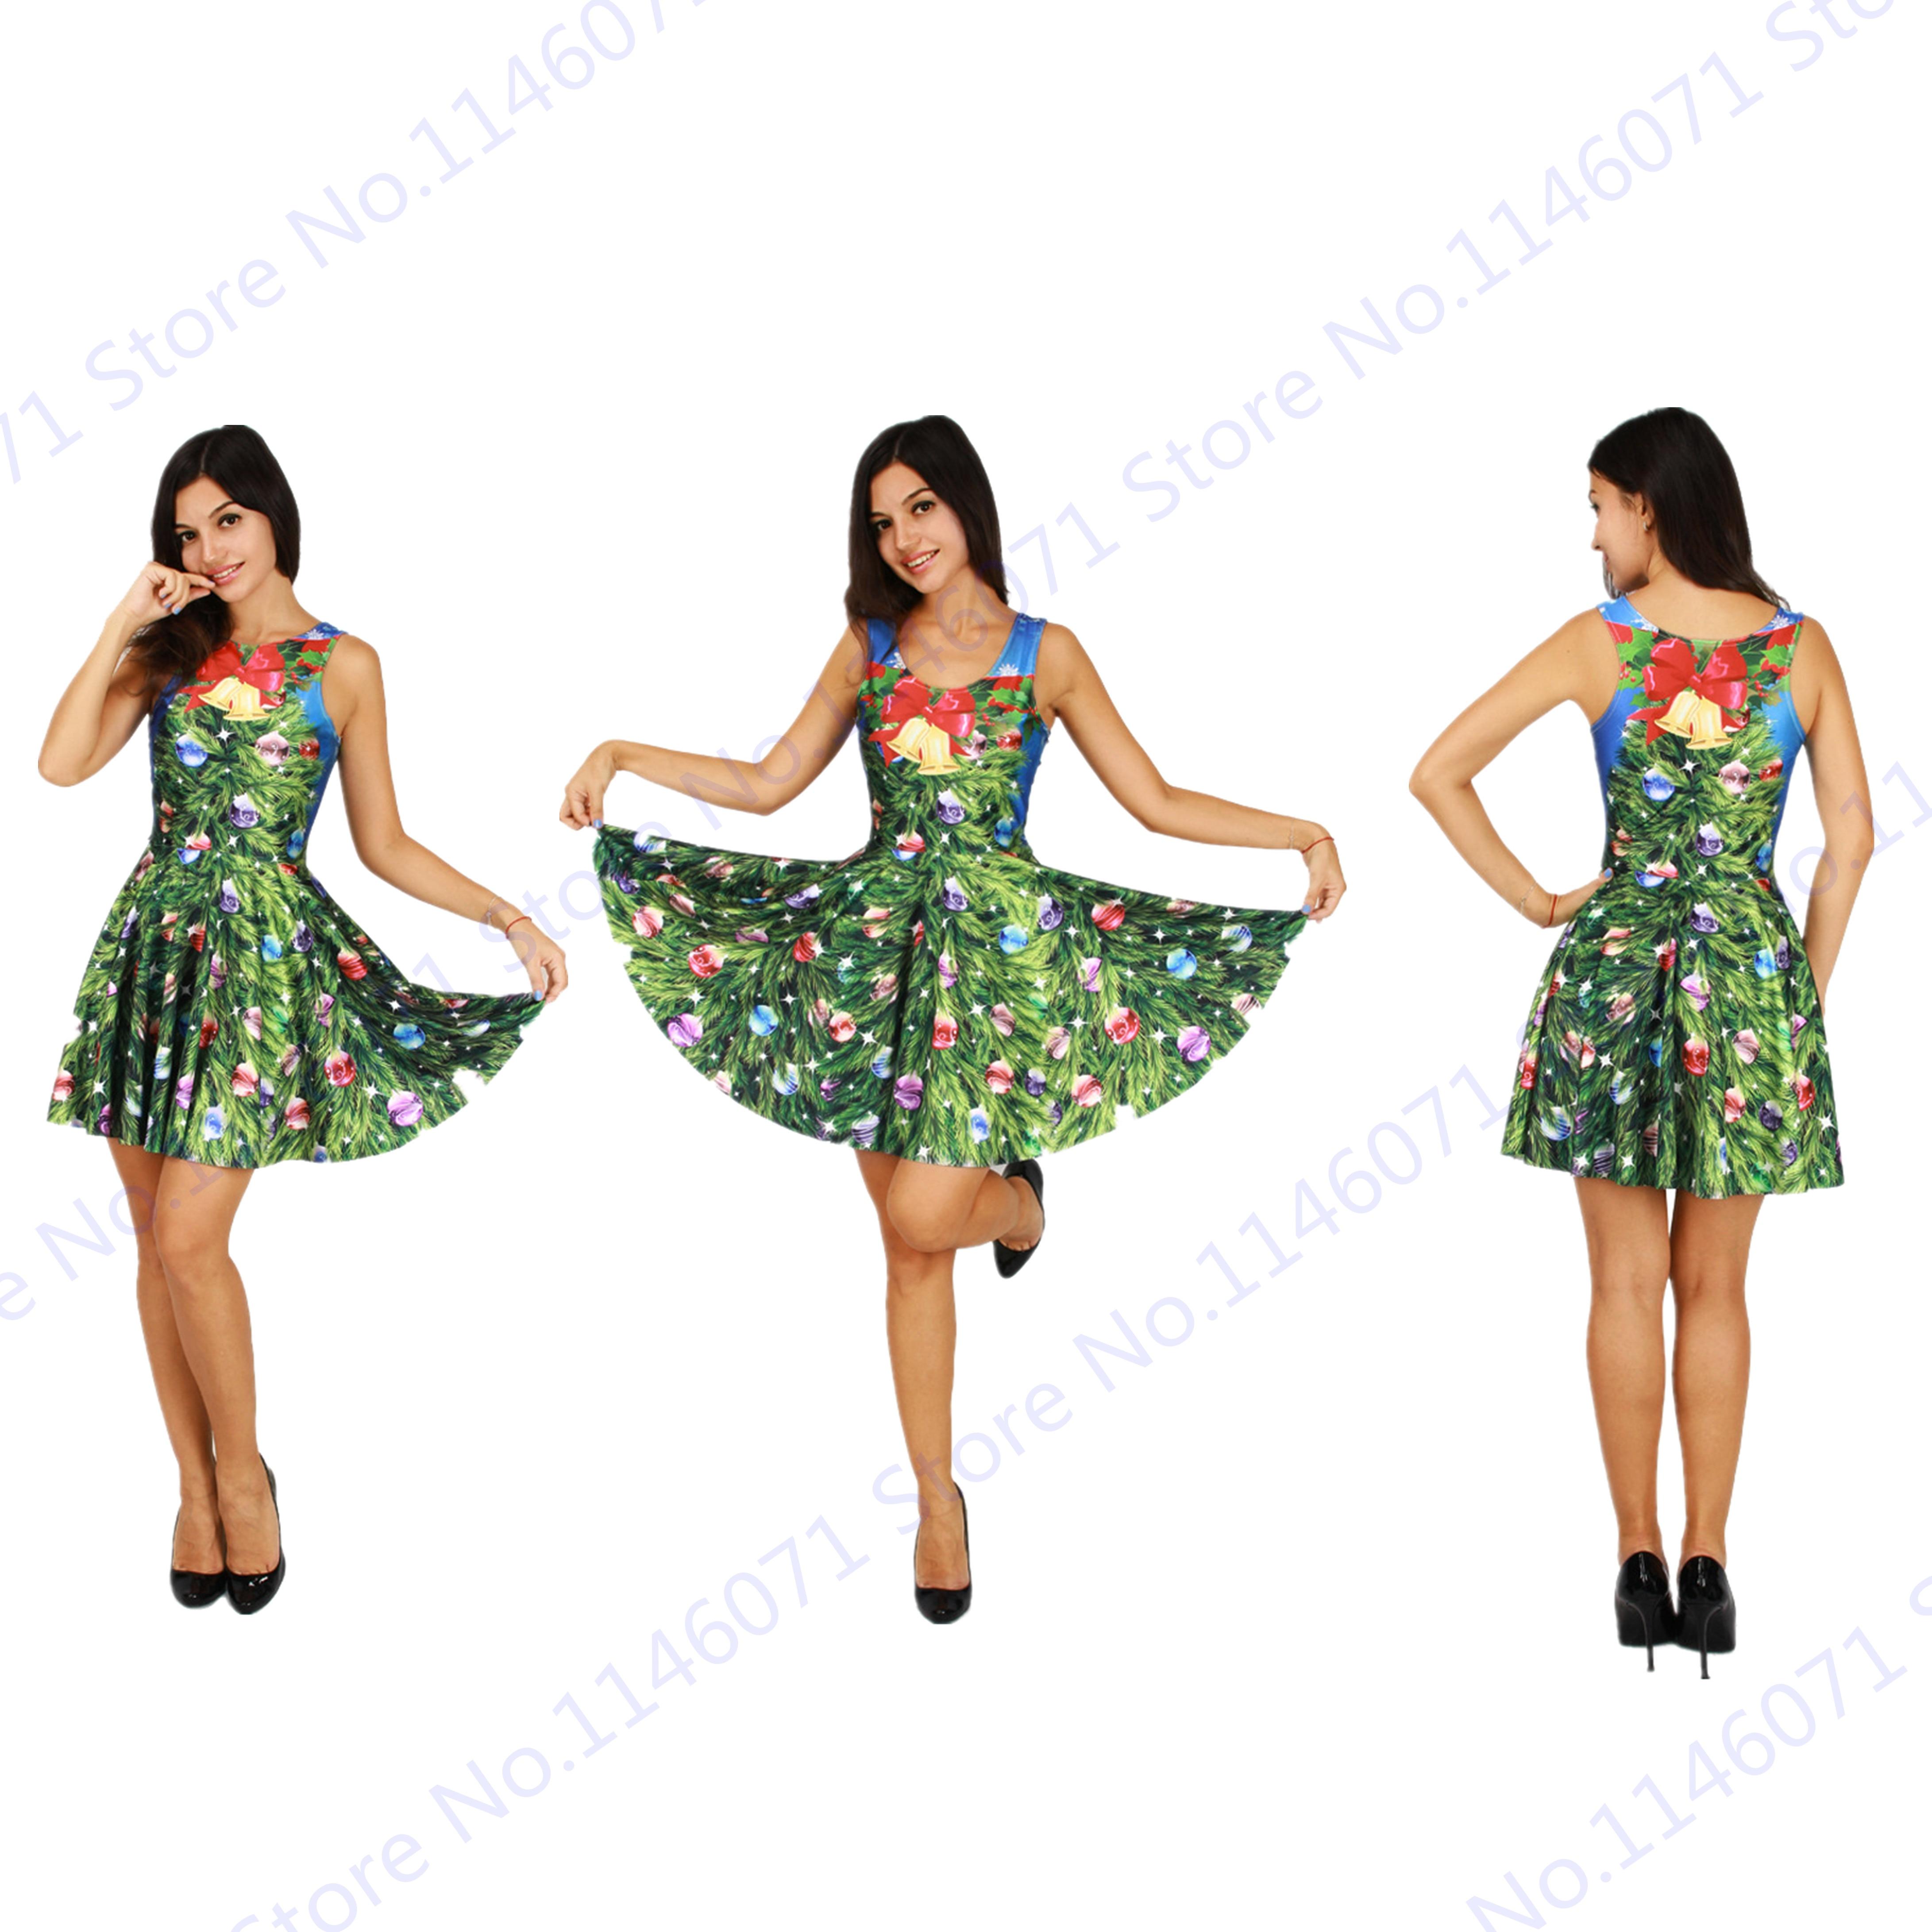 Green Christmas Trees Jingle Bells Skater Dresses Reversible y